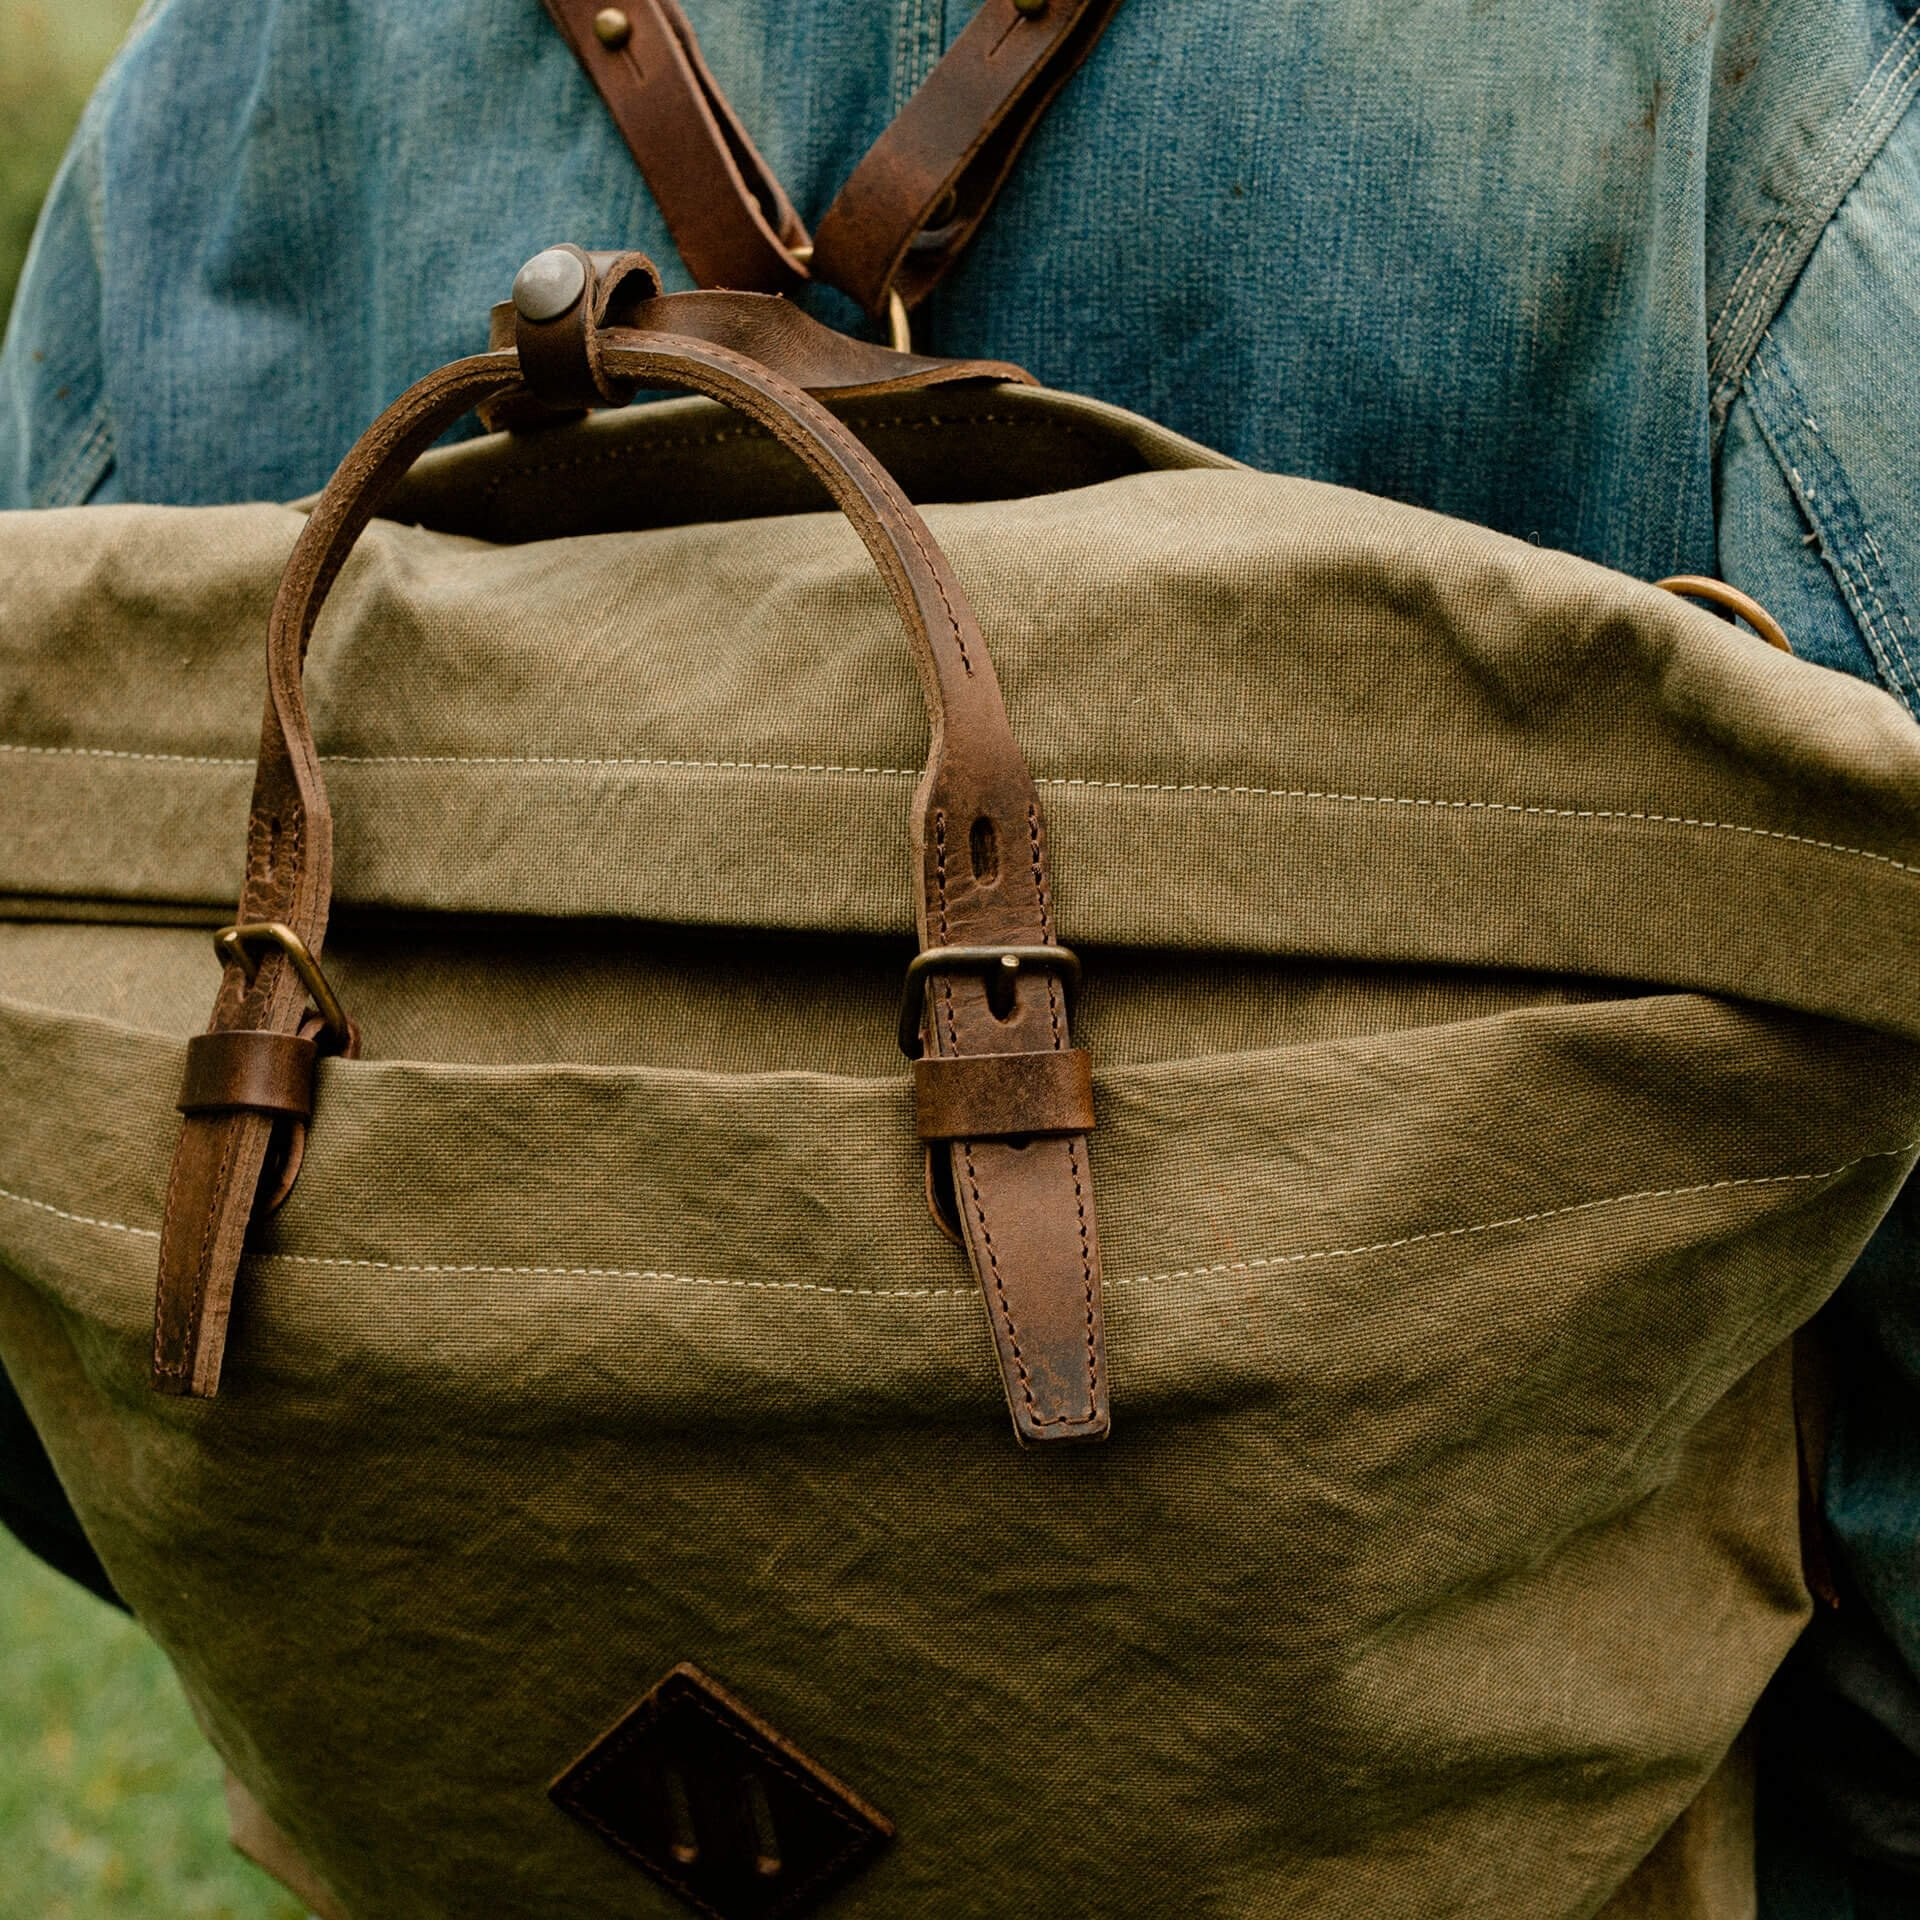 Woody L Backpack - Wheat  (image n°5)